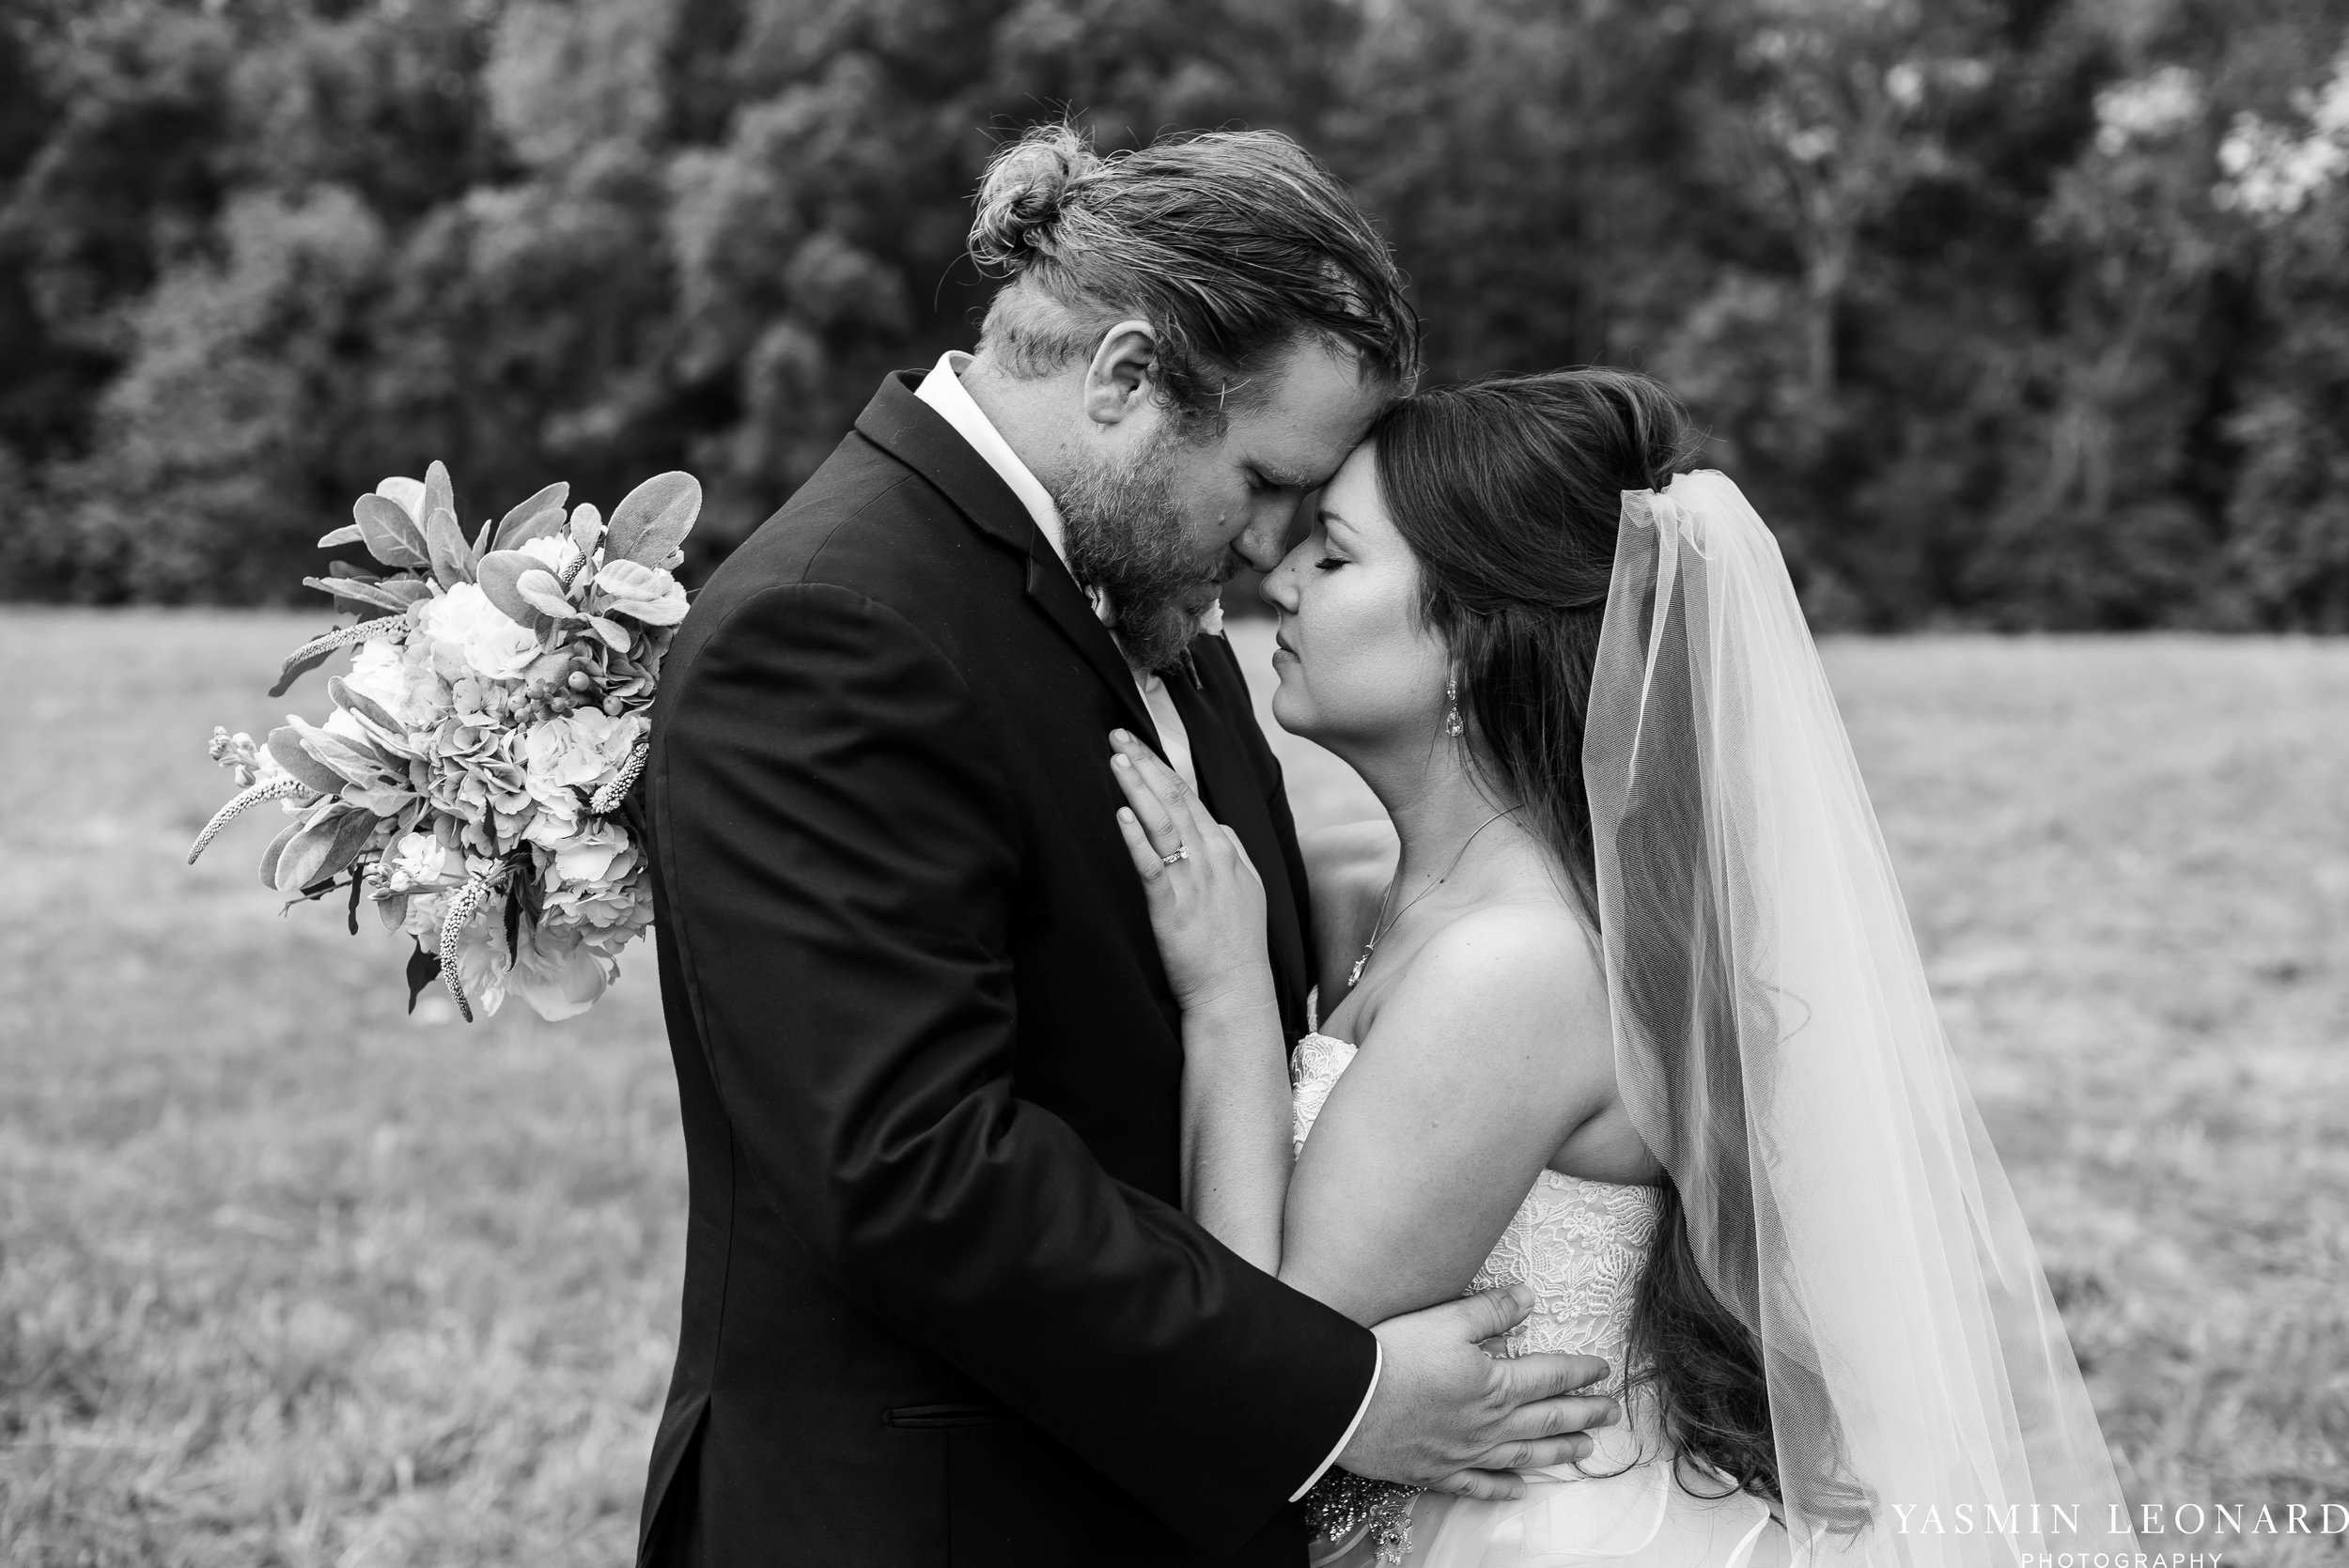 Rain on your wedding day - Rainy Wedding - Plan B for Rain - What to do if it rains on your wedding day - Wedding Inspiration - Outdoor wedding ideas - Rainy Wedding Pictures - Yasmin Leonard Photography-43.jpg